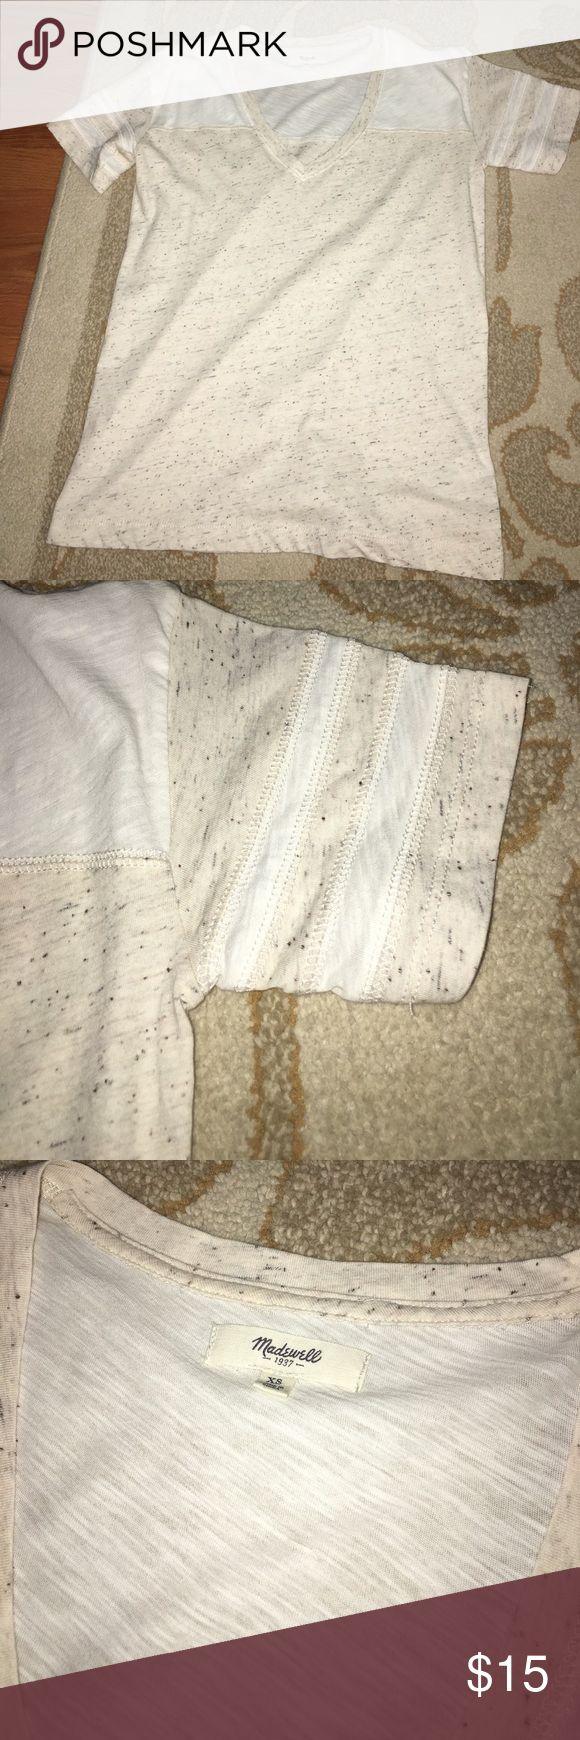 Brand new madewell varsity striped cream tee Brand new, XS Madewell Tops Tees - Short Sleeve